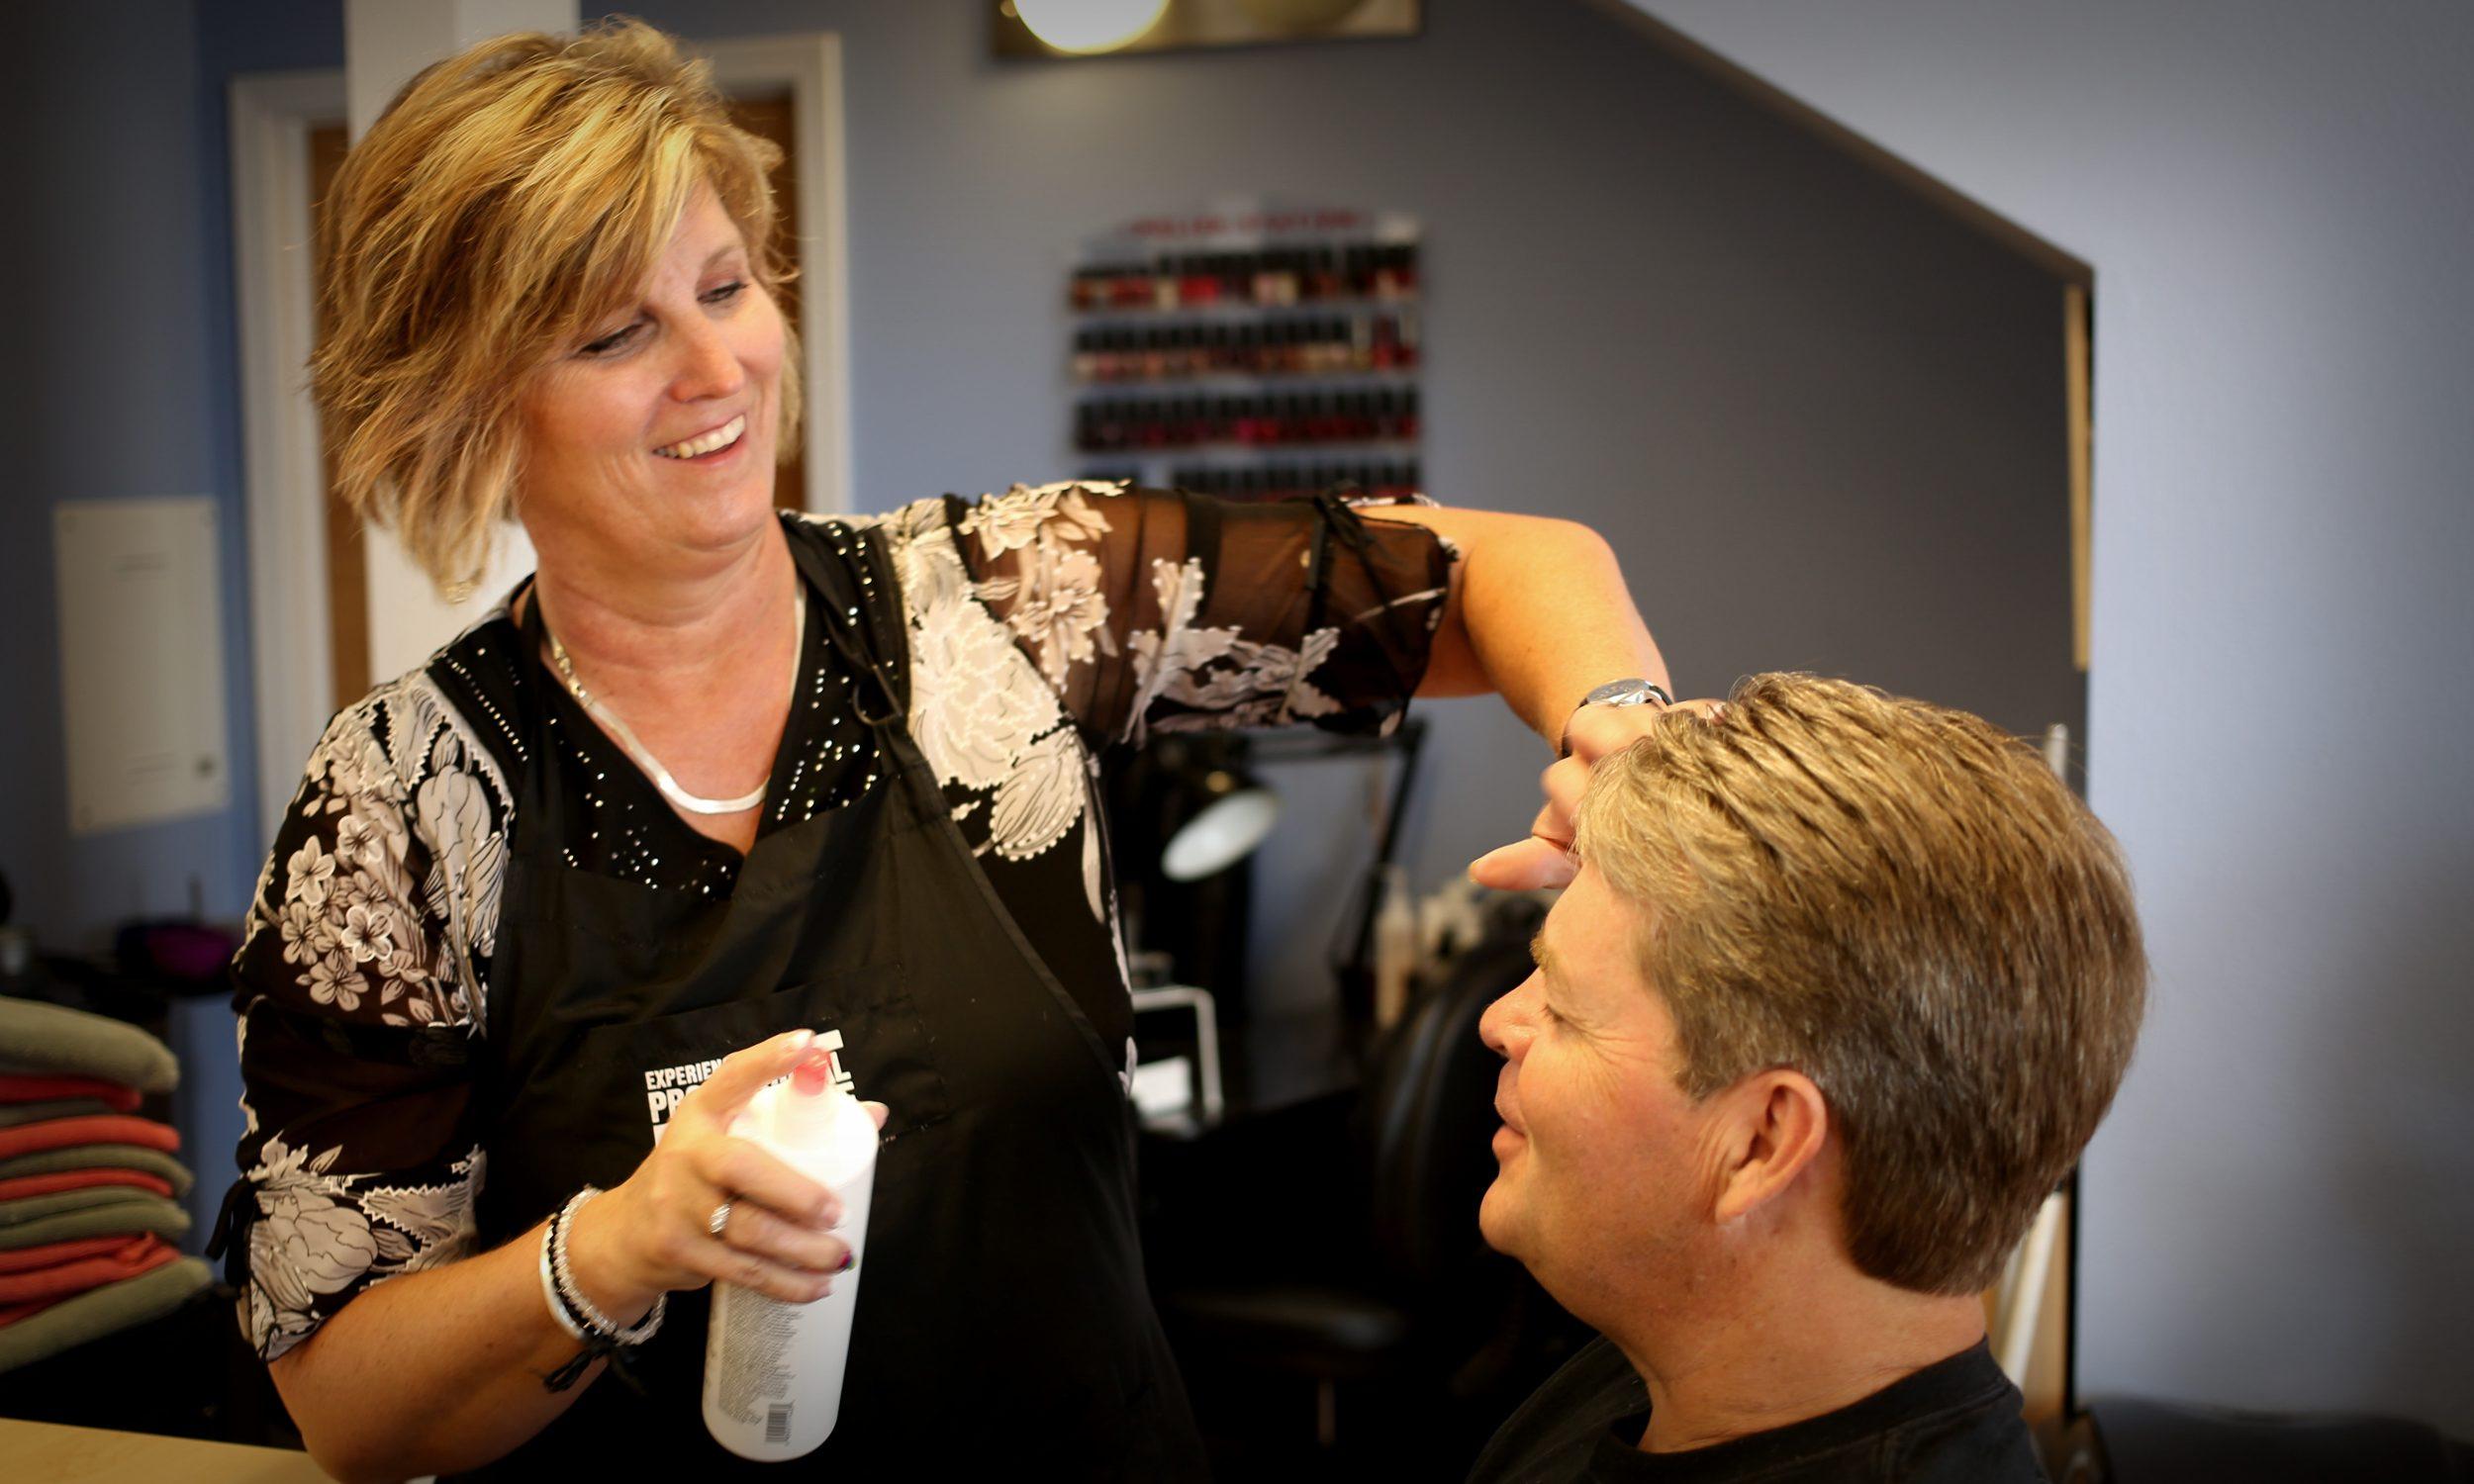 Client – Grand Junction Hair Salon